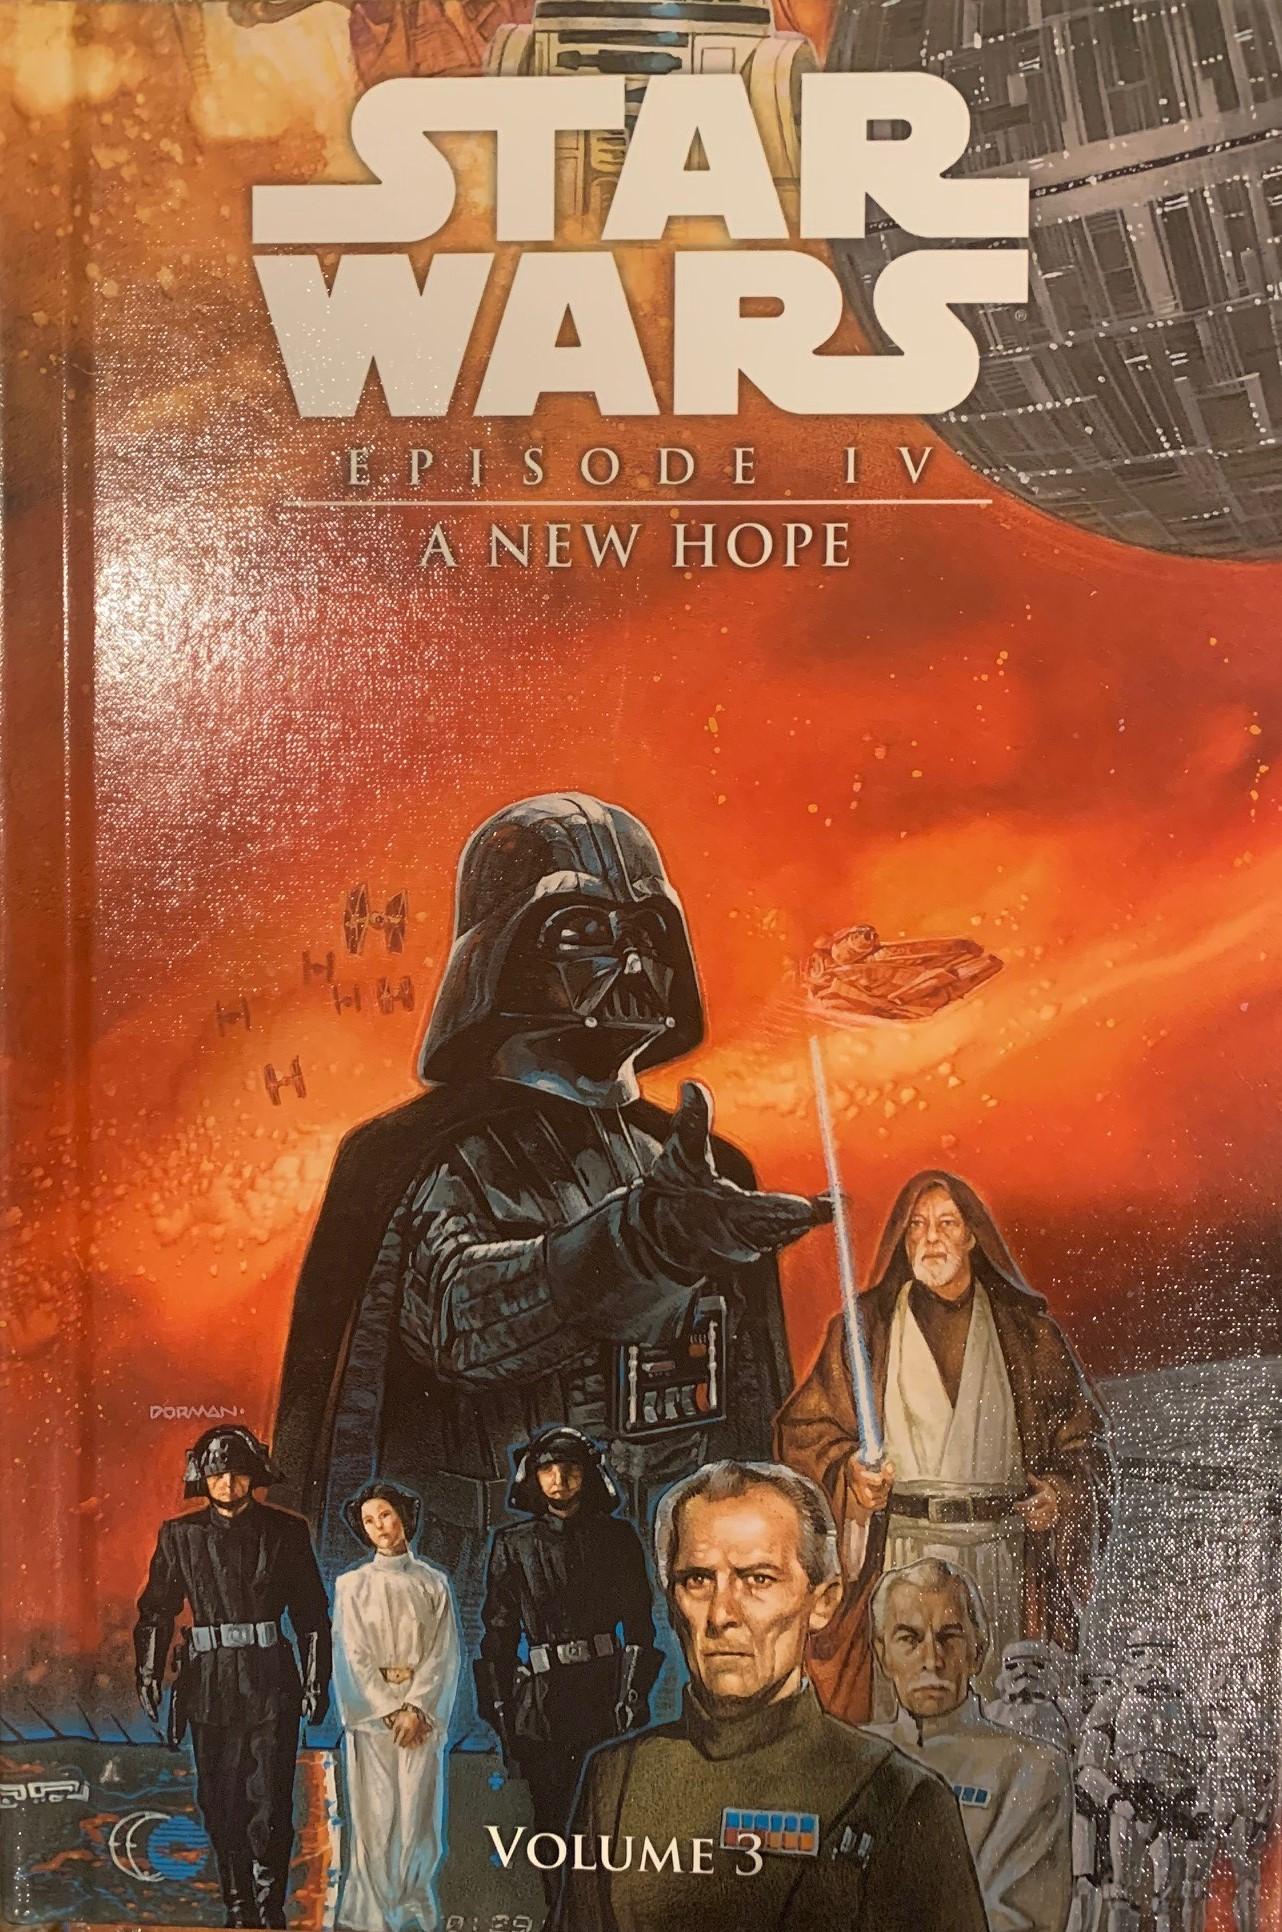 Star Wars Episode IV: A New Hope (Spotlight Comic Edition, Volume 3)